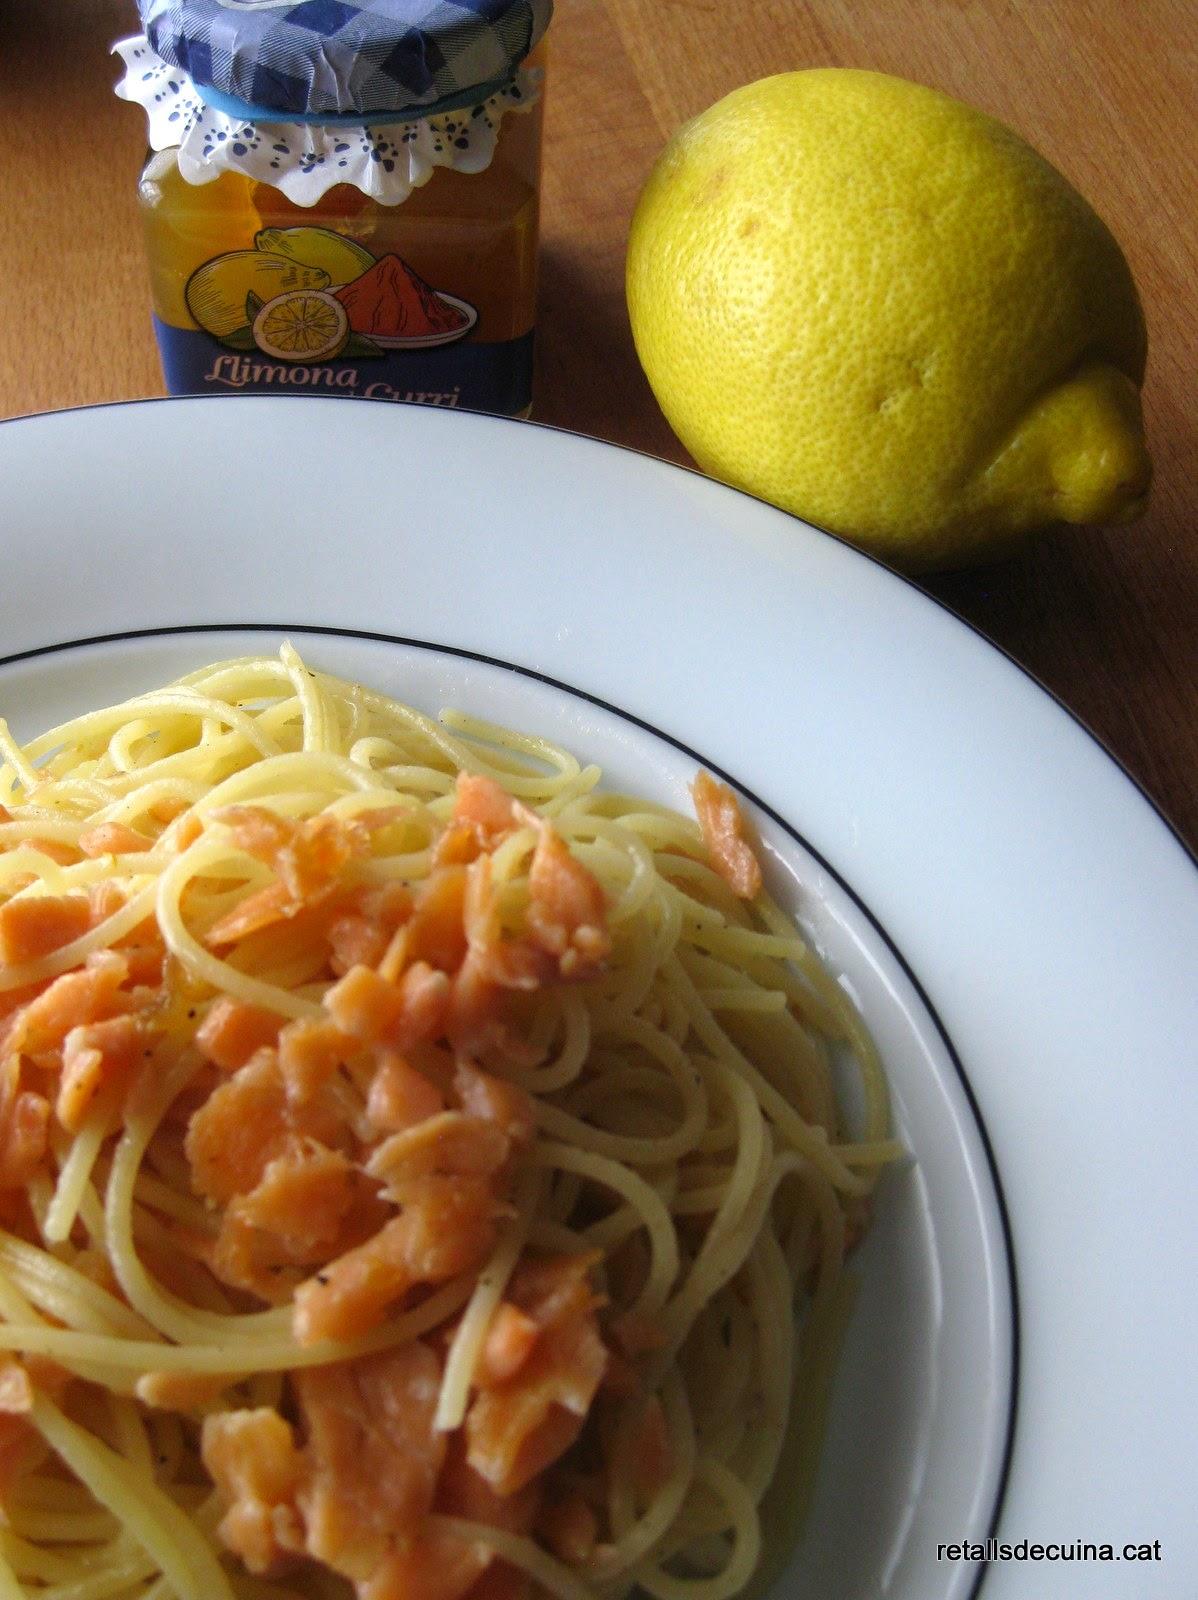 Spaguetti amb salmó i melmelada de llimona al curry